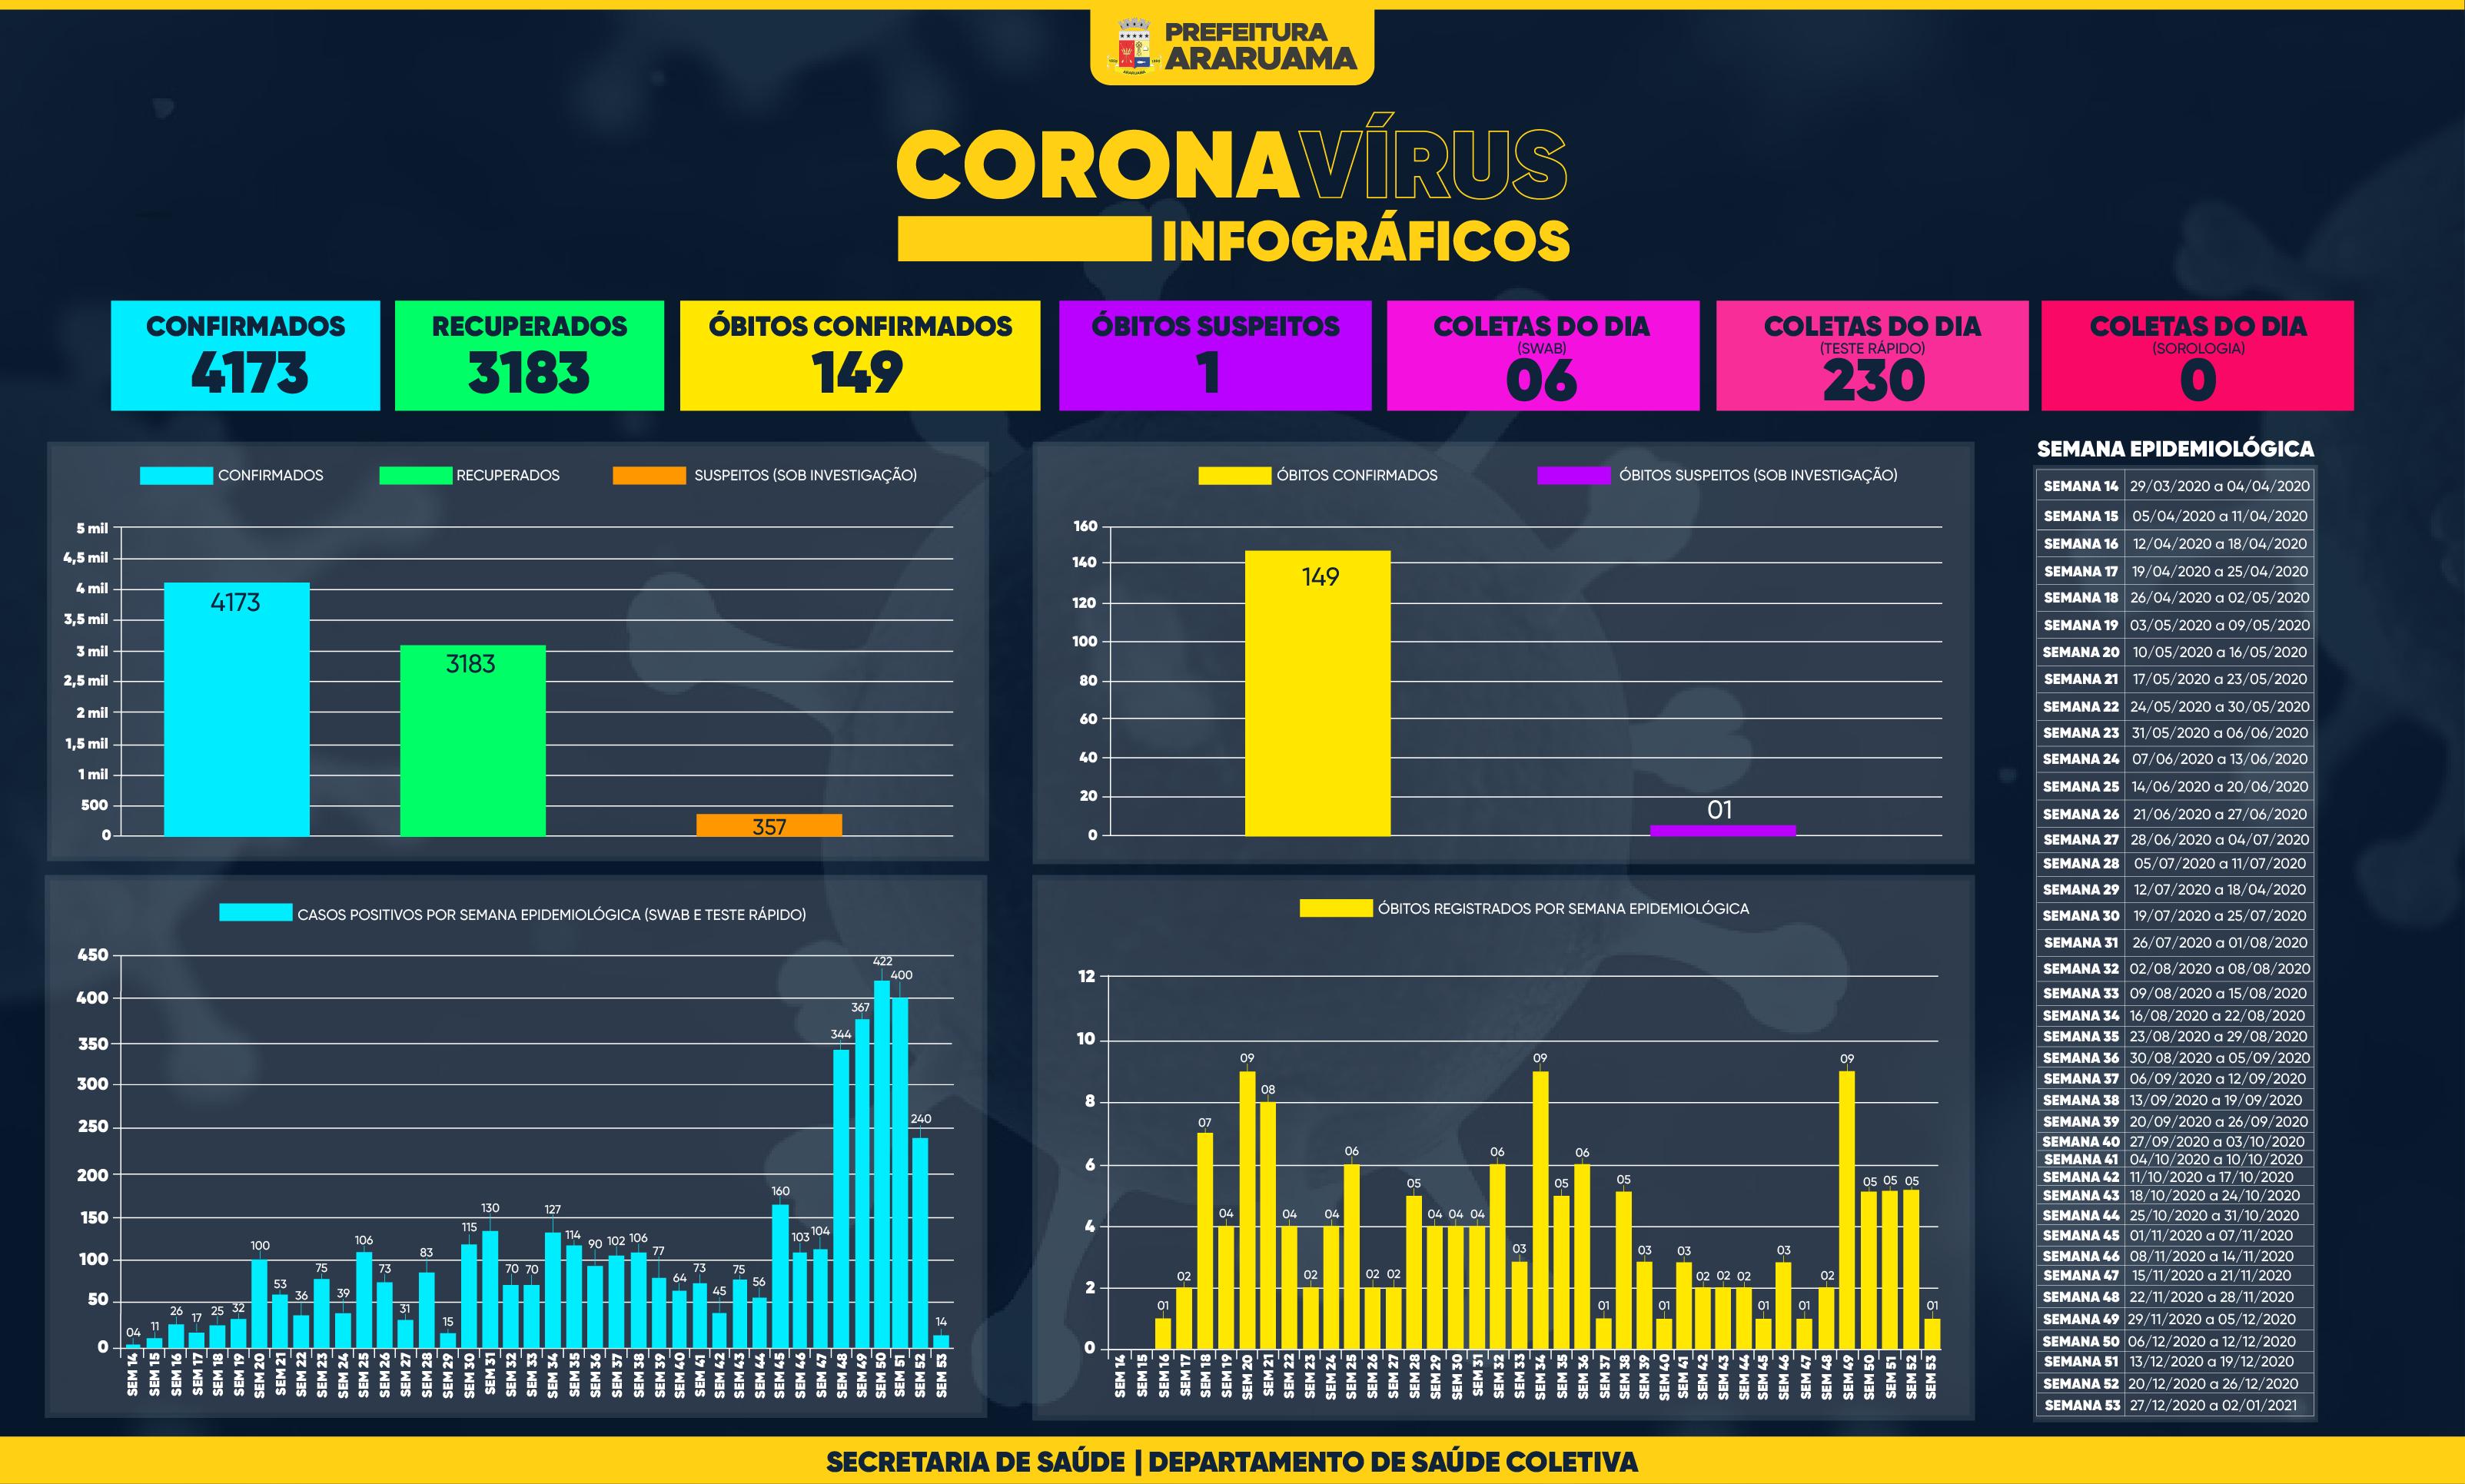 Painel de Monitoramento COVID-19 — Semana 53 — 29 de dezembro de 2020